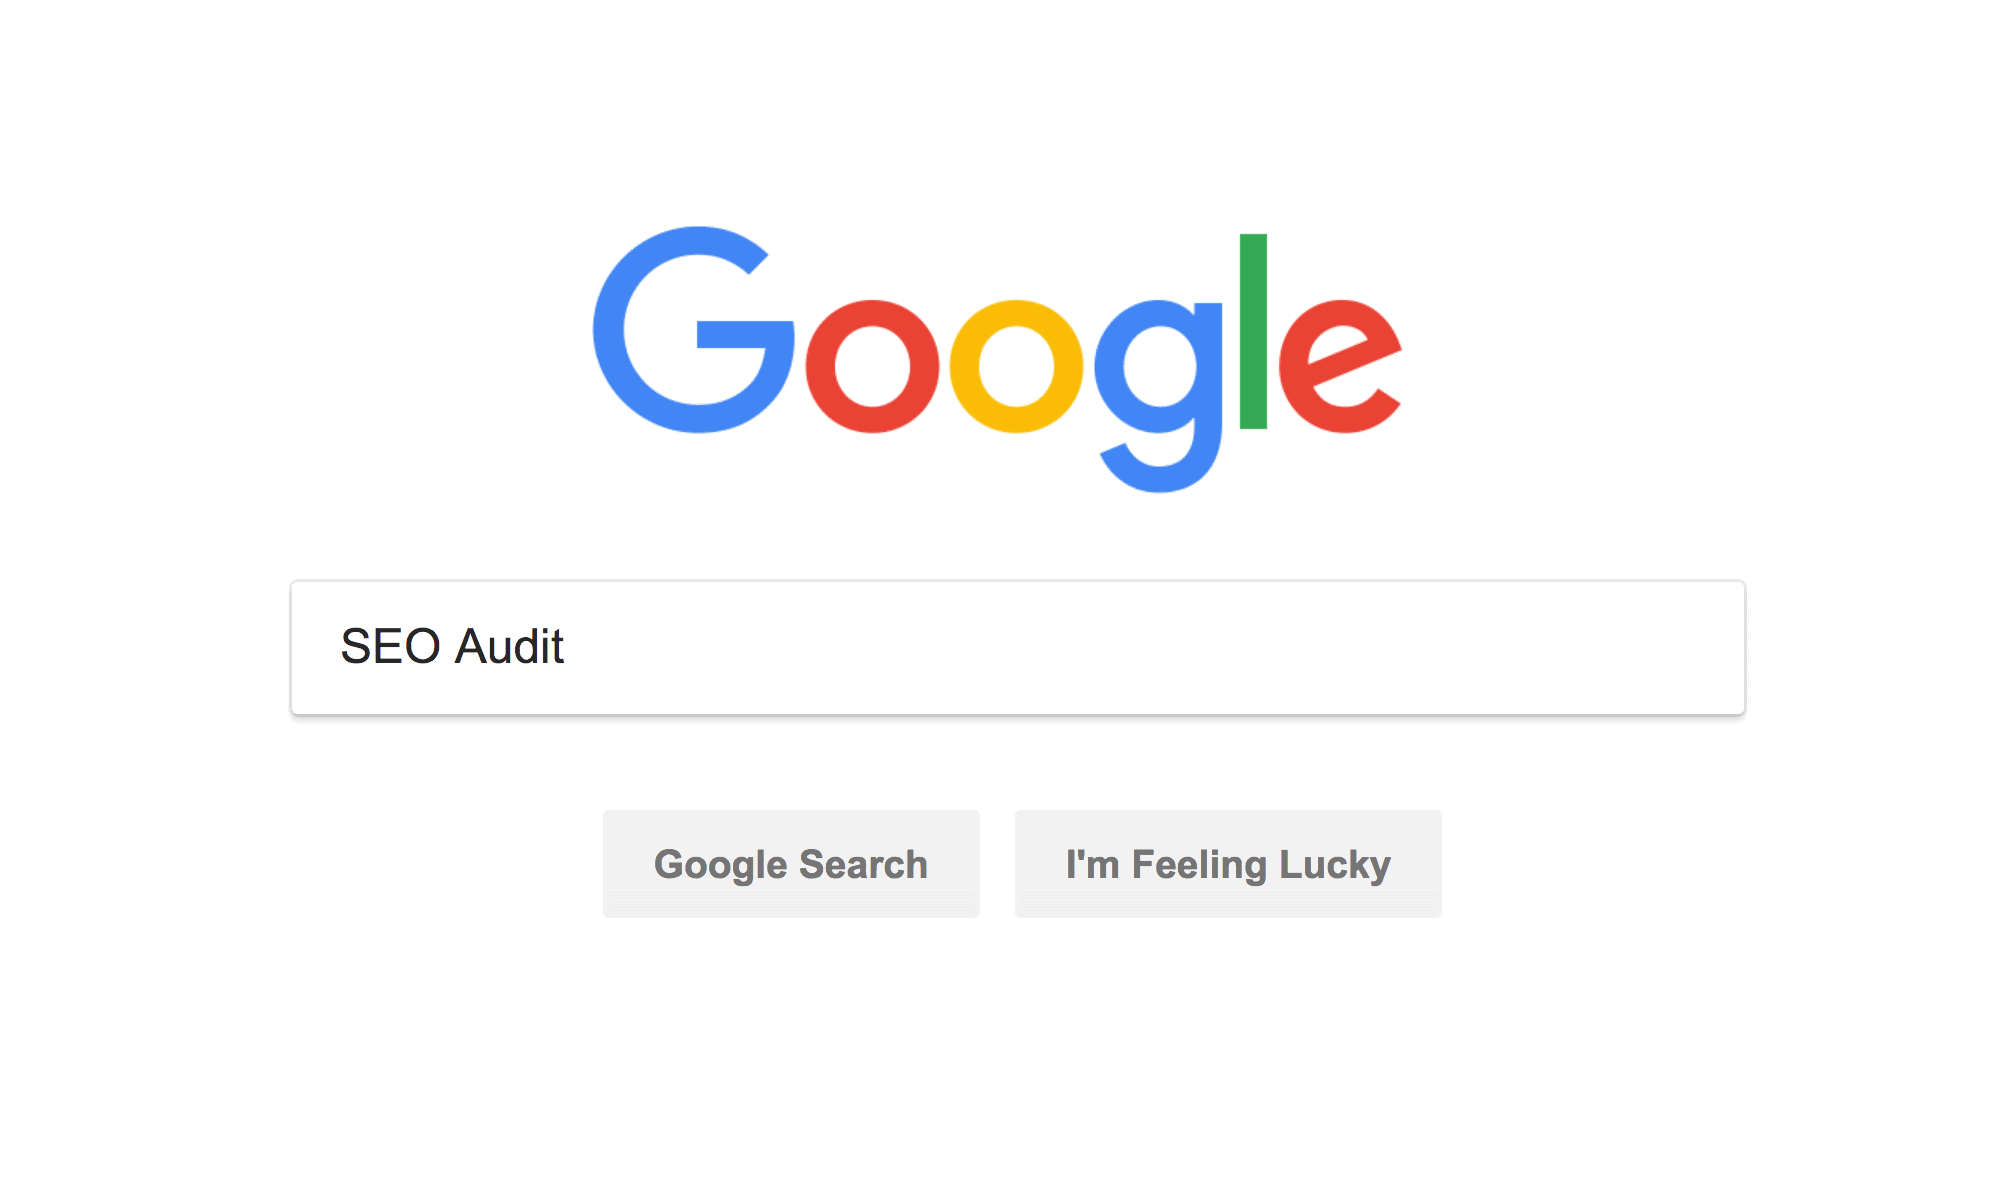 Google SEO Audit